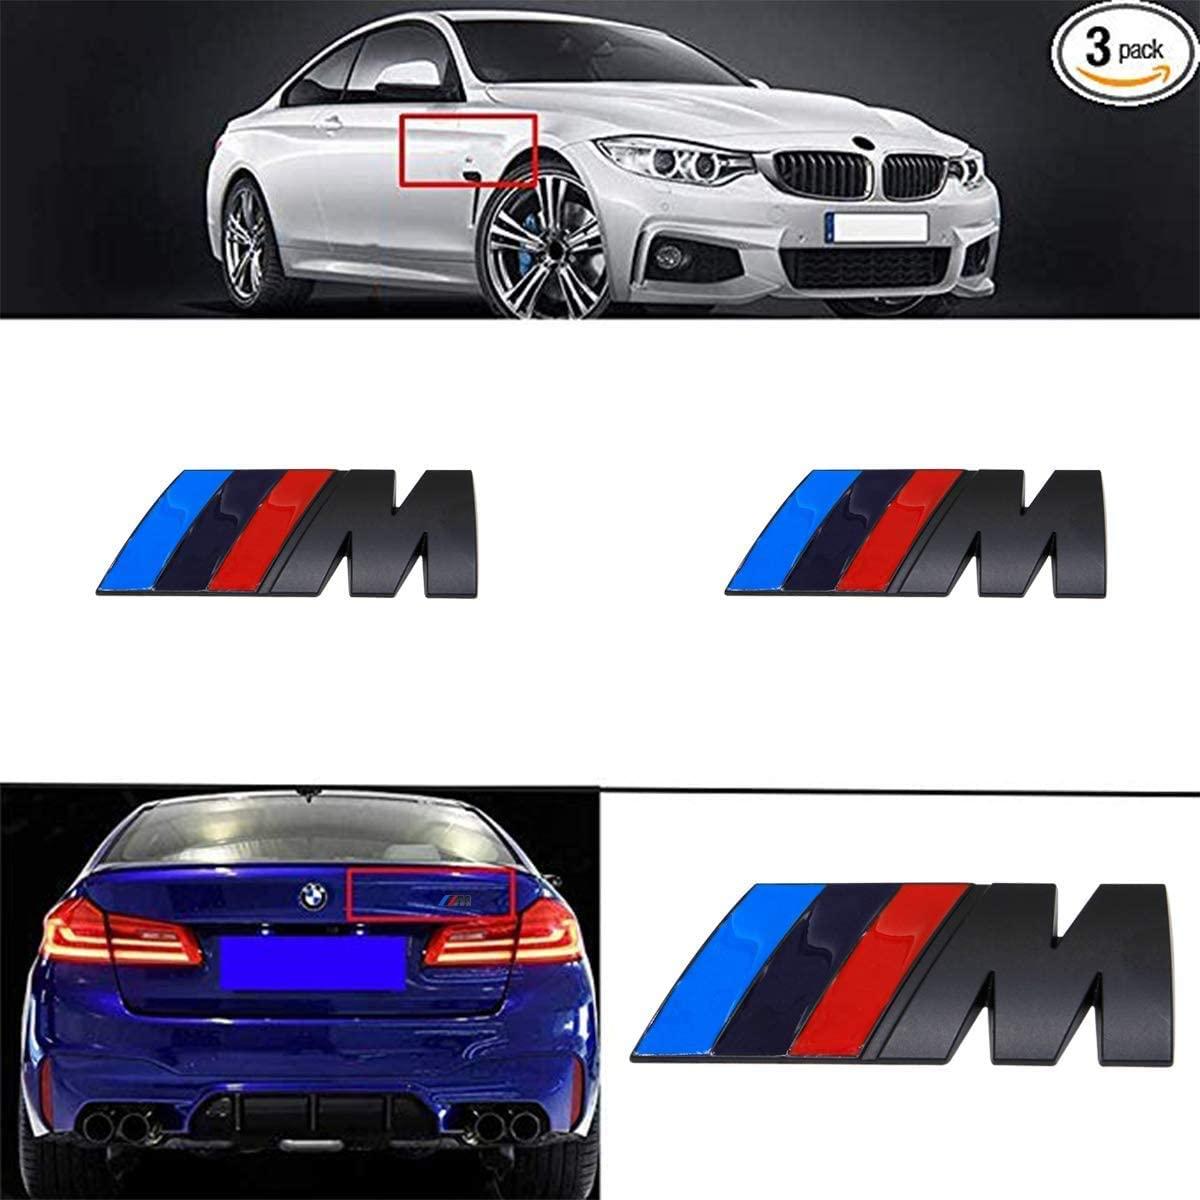 Westion 3pcs BMW M Power Badge Tri Color Rear Emblem Fender Side Emblem Car Decal Logo Sticker for All BMW Accessories (black)